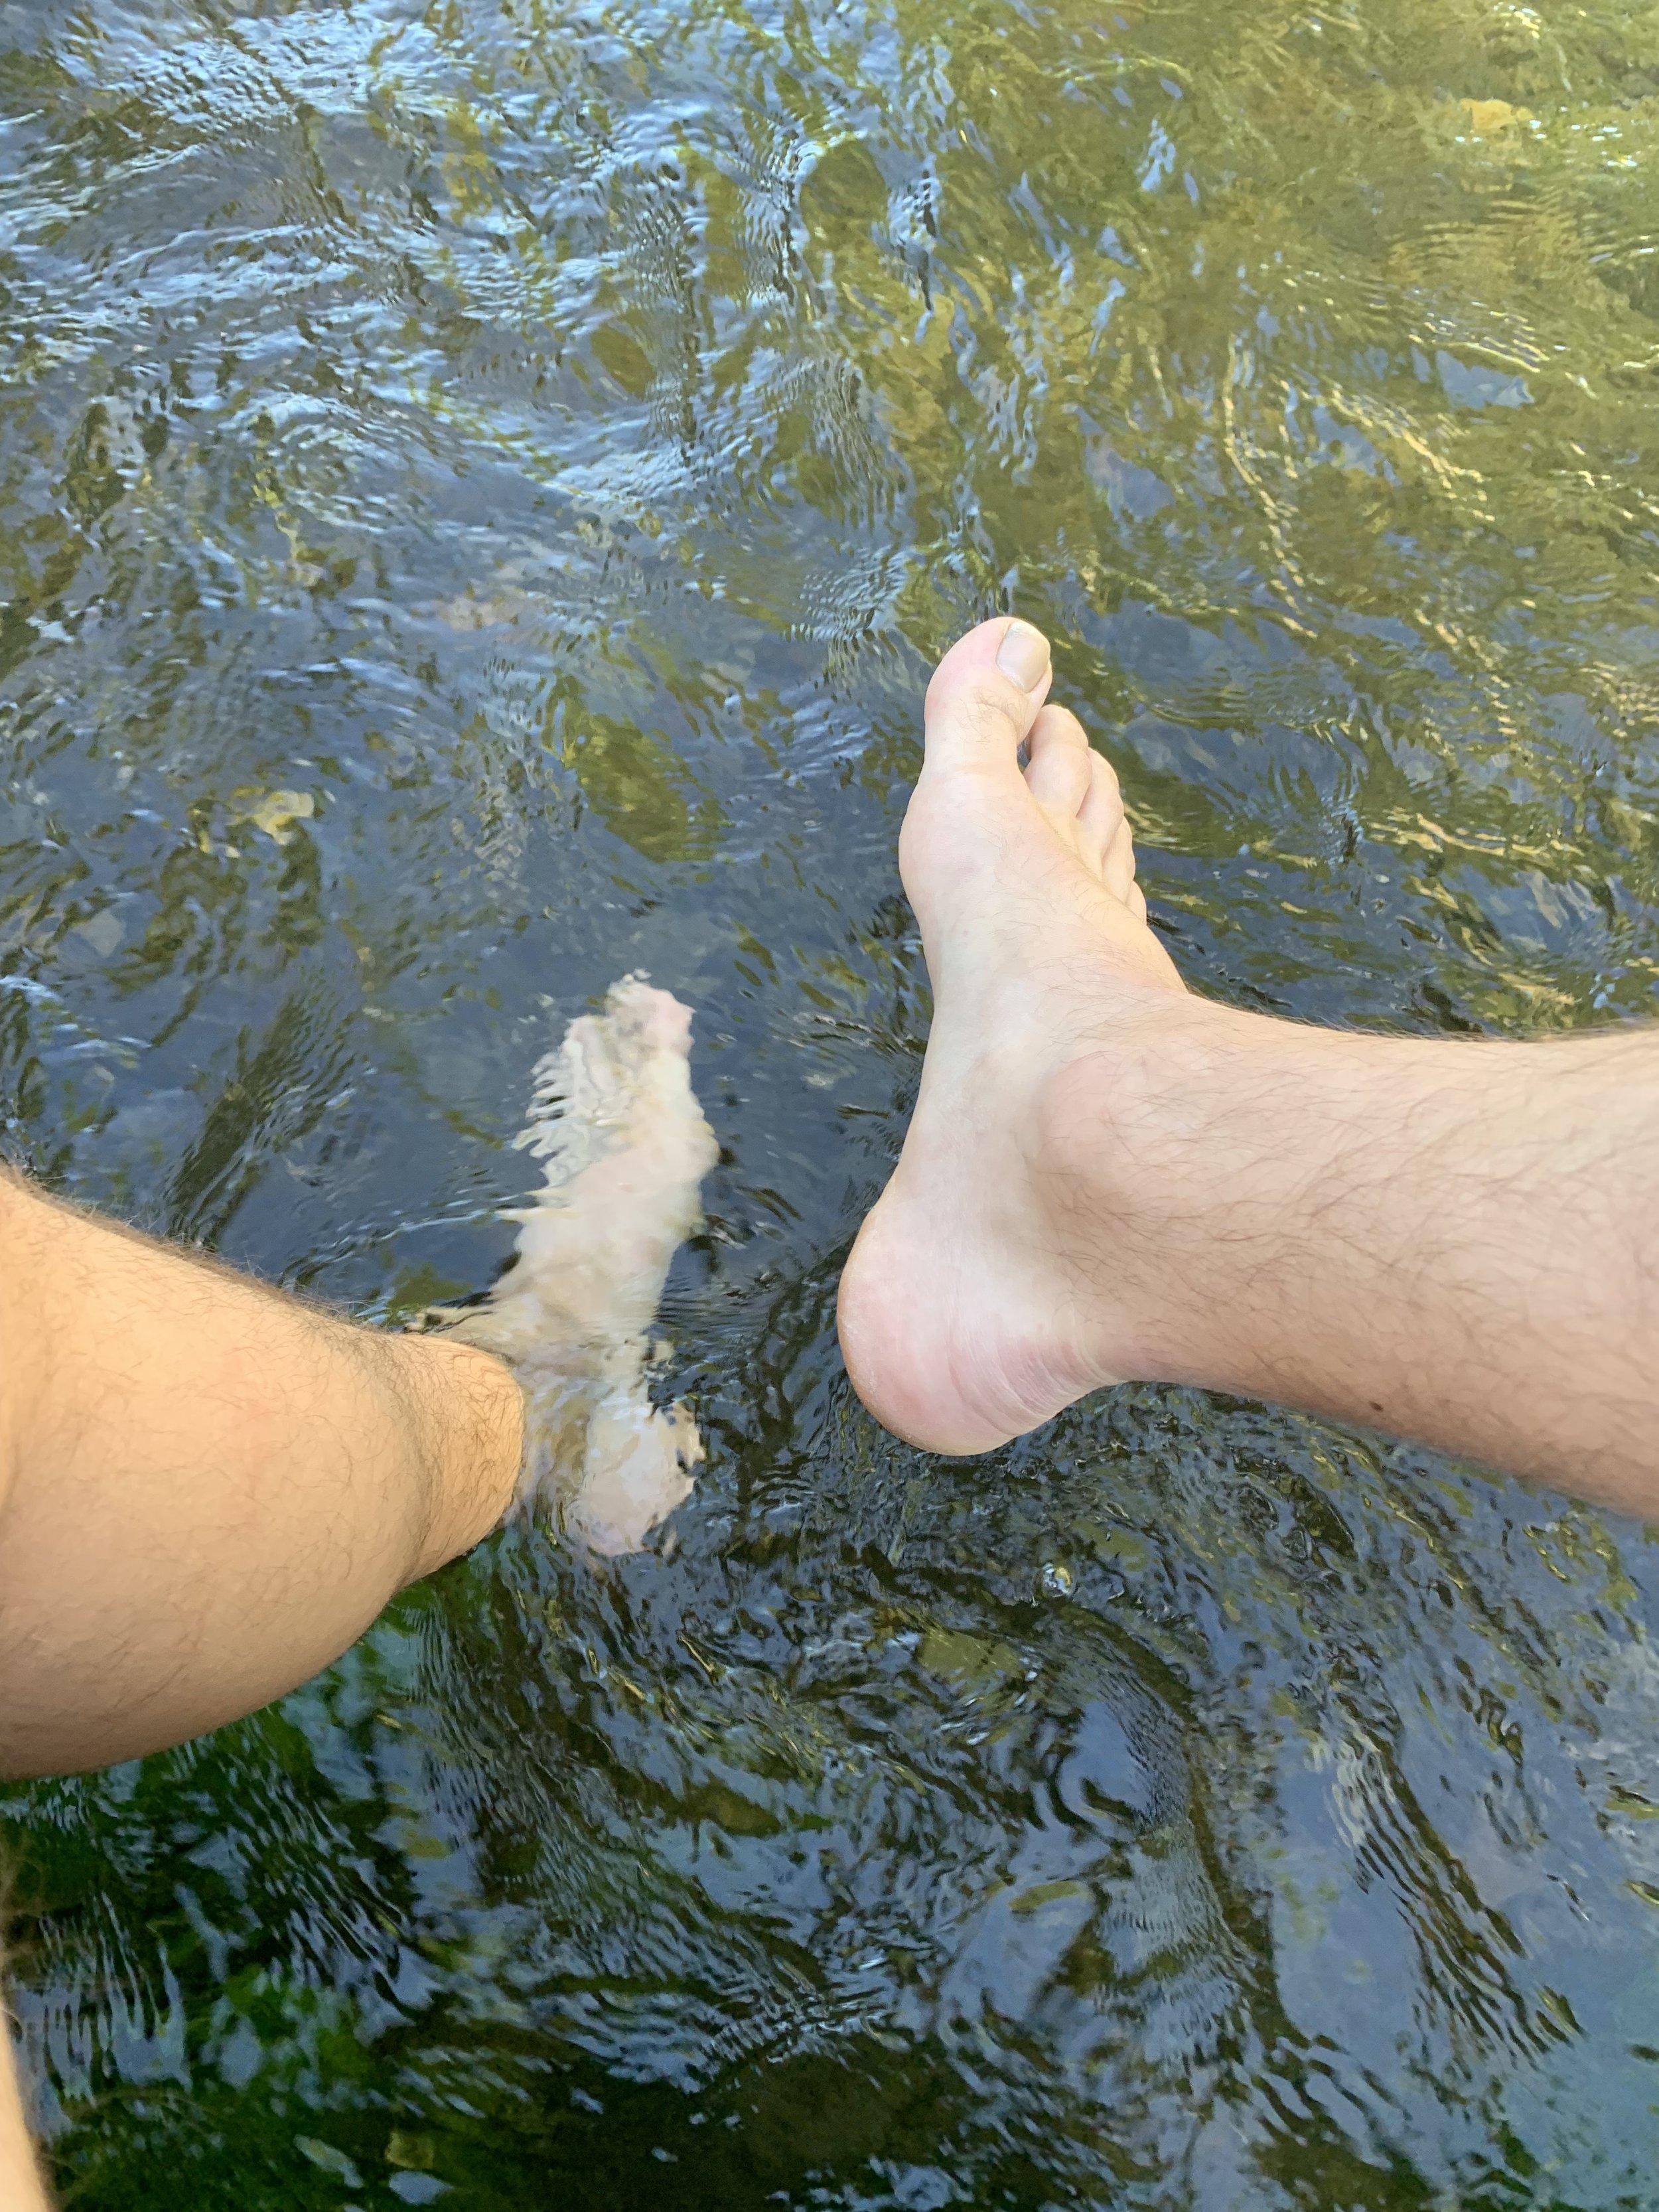 Soaking my feet in the ice cold river at Ribadiso Da Baixo